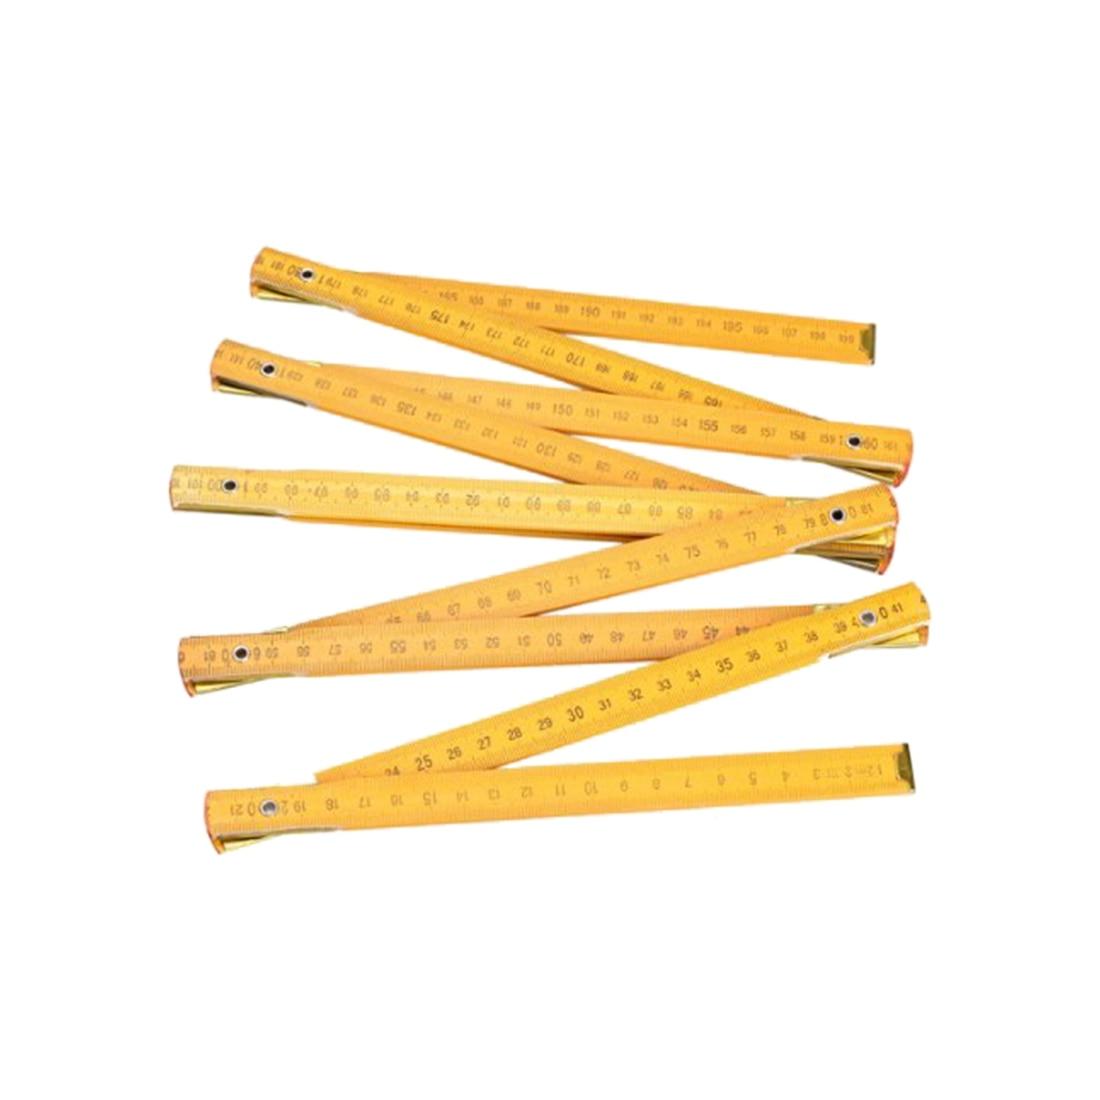 Portable Carpenter Wooden Folding Ruler 200cm/79inch